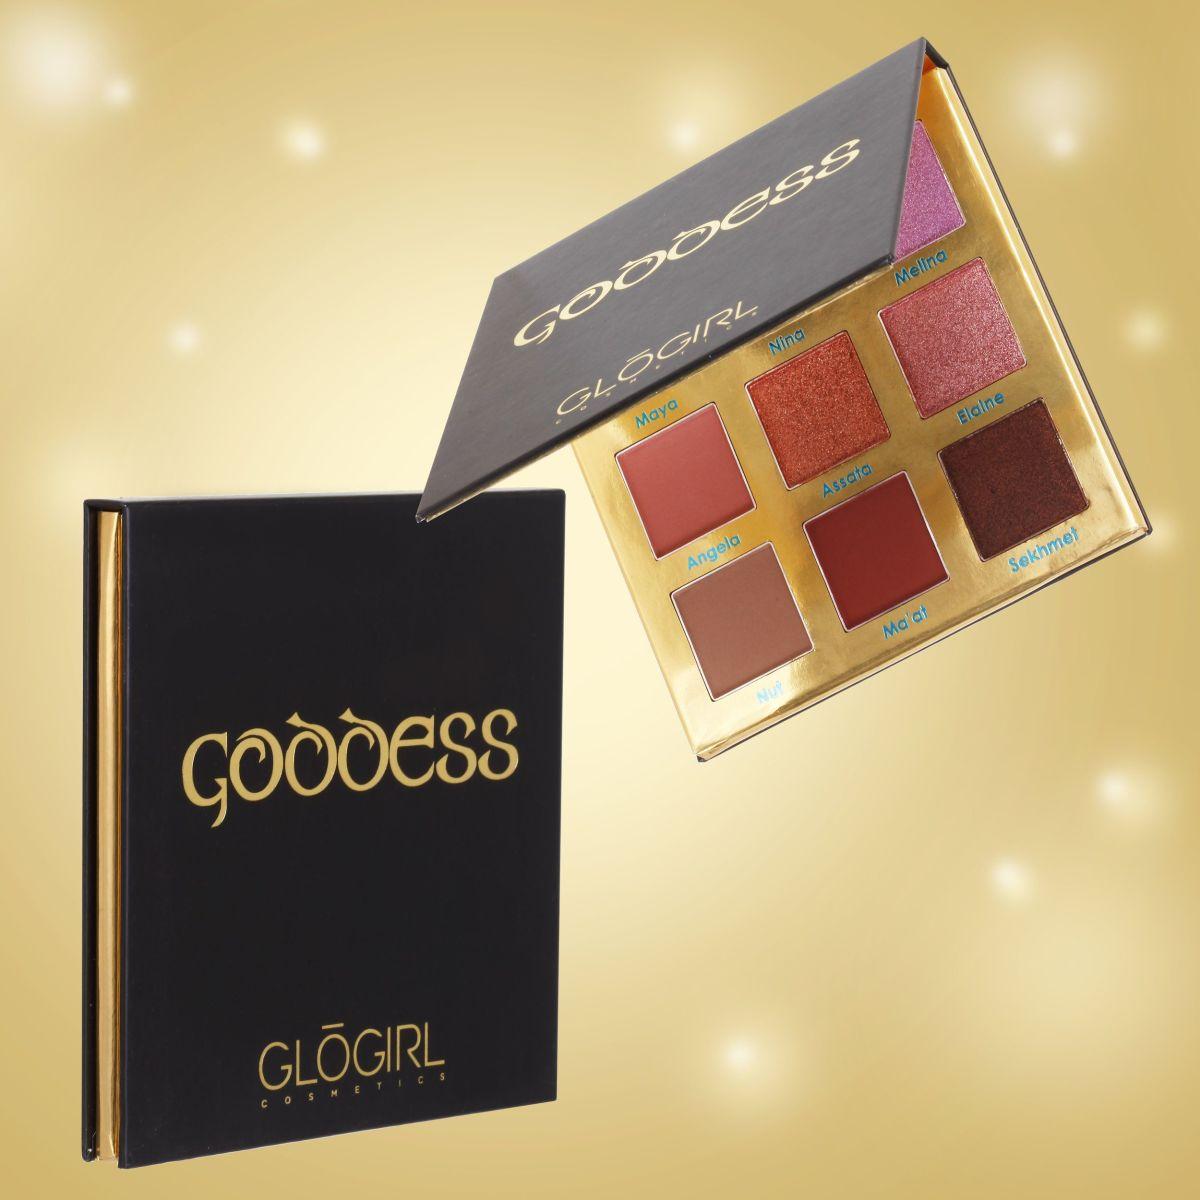 GloGirl Cosmetics